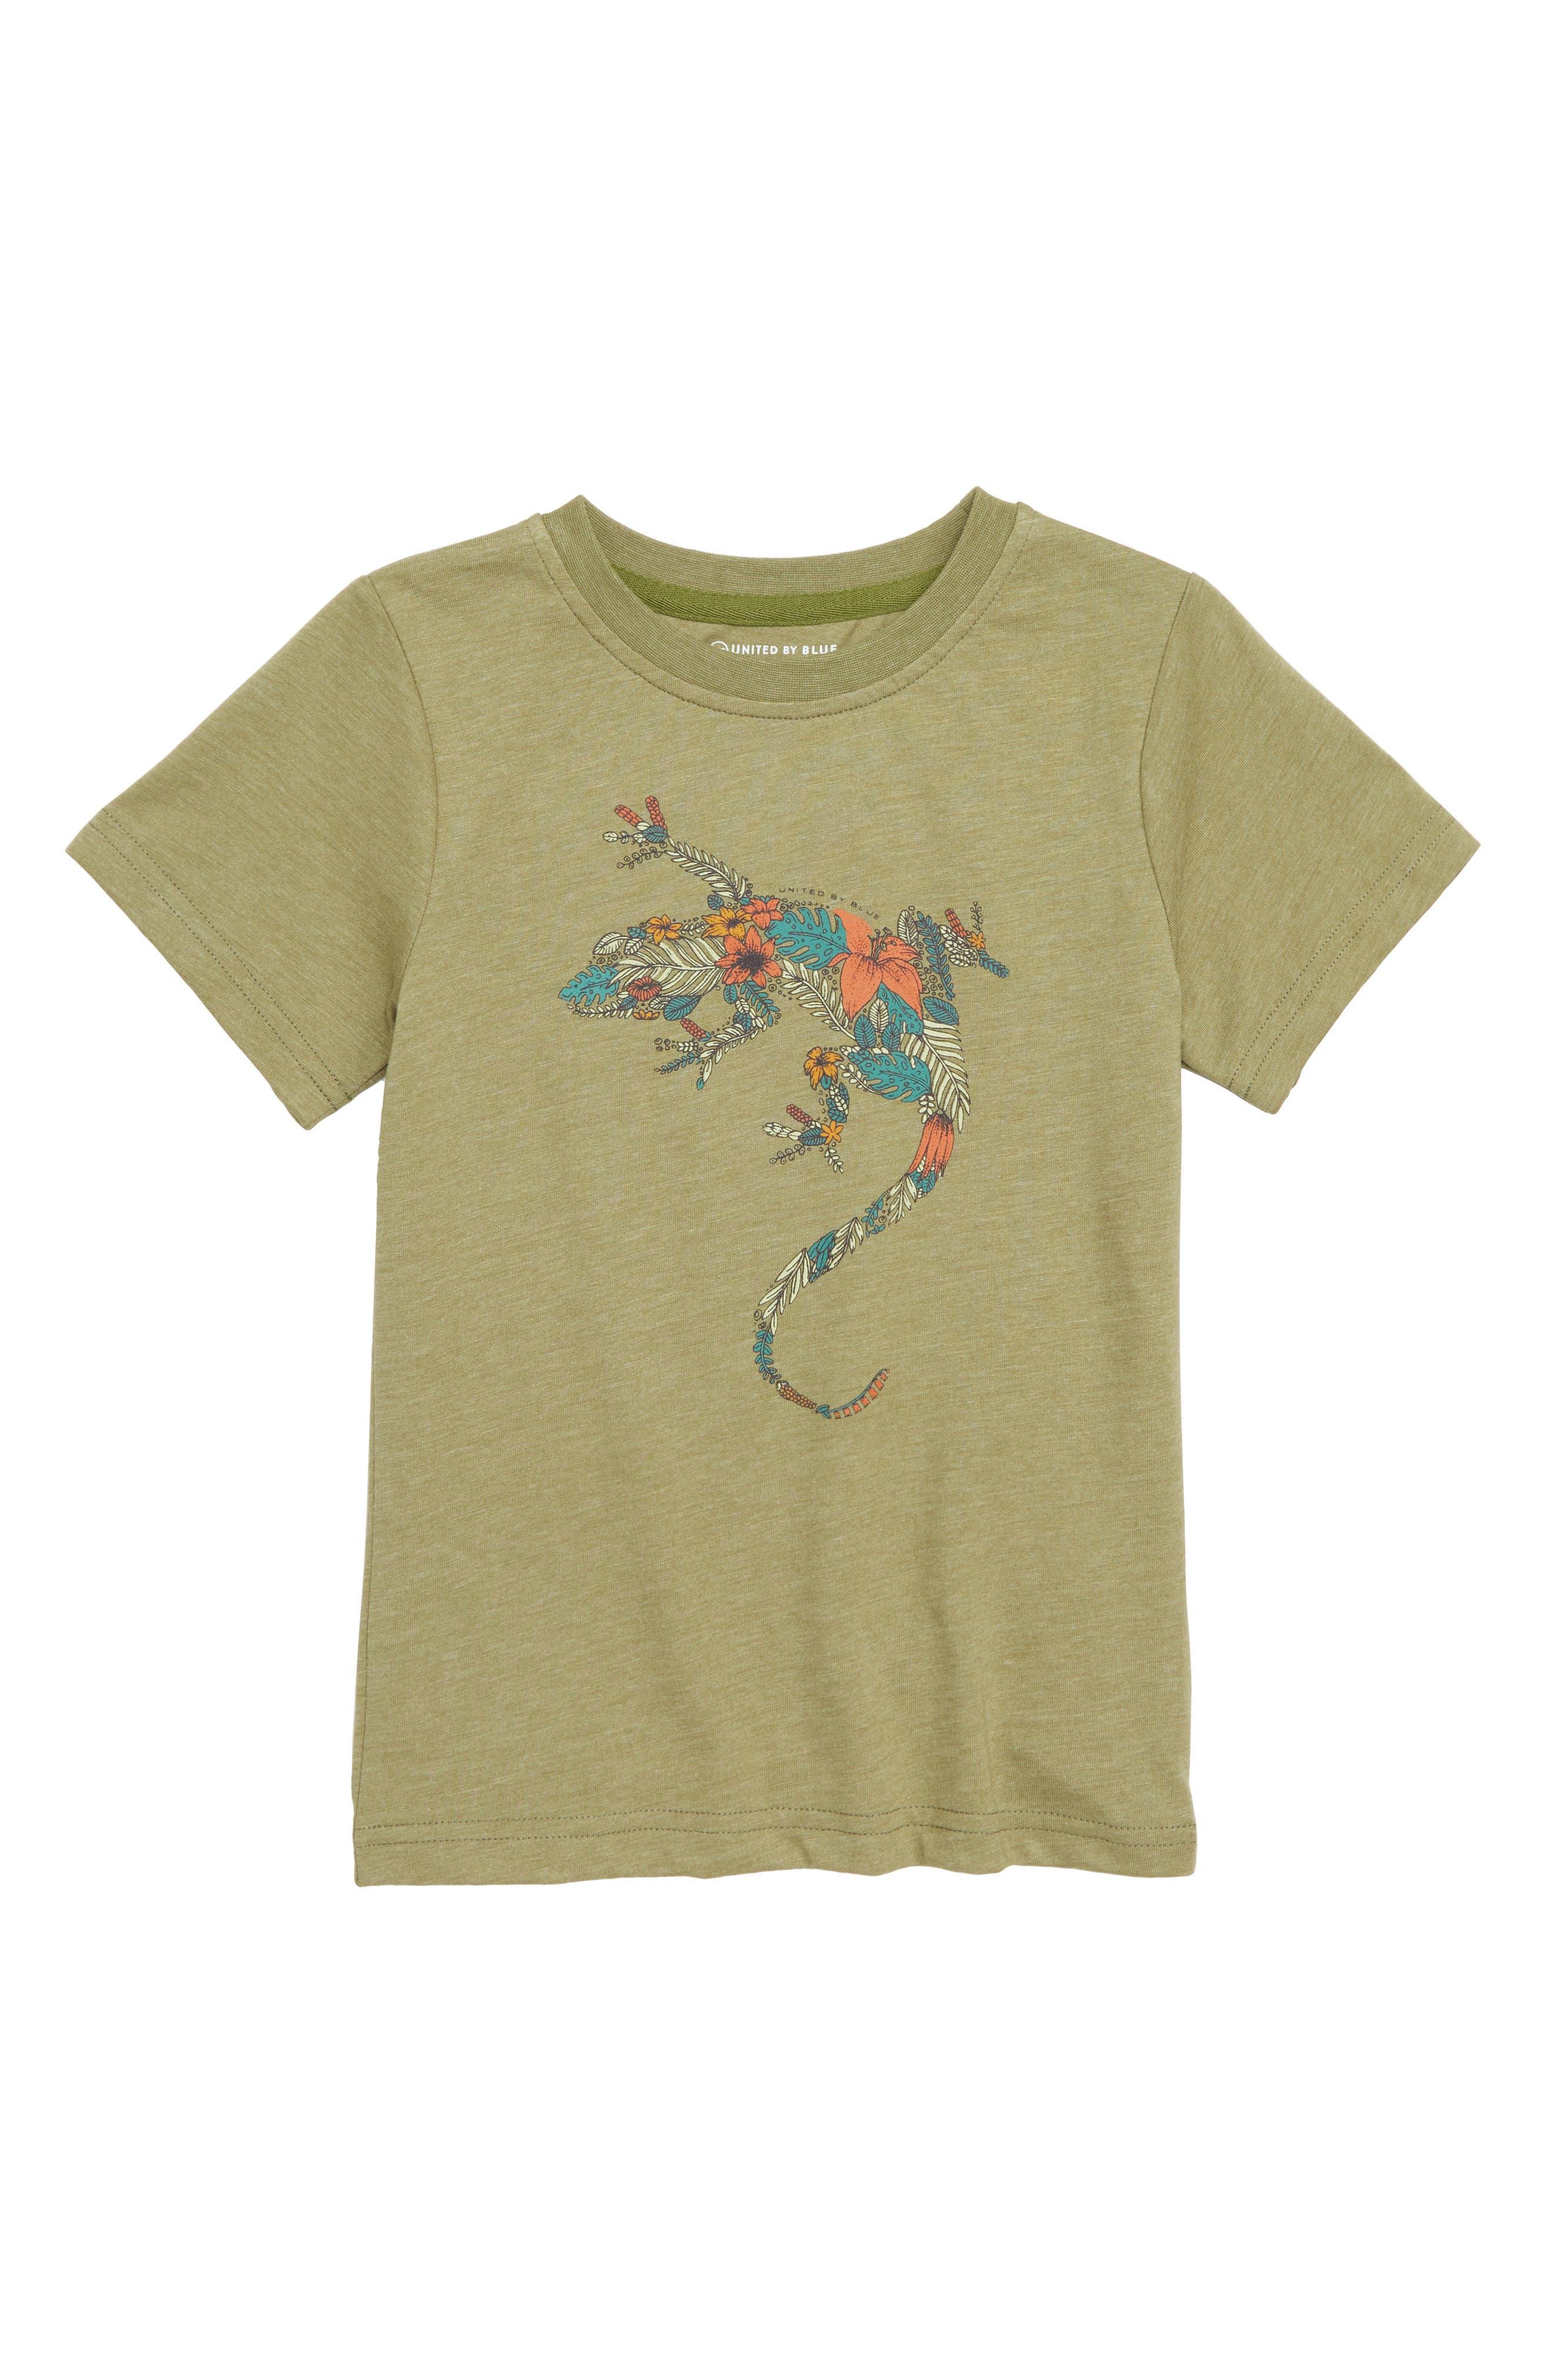 Wild Gecko T-Shirt,                             Main thumbnail 1, color,                             OLIVE